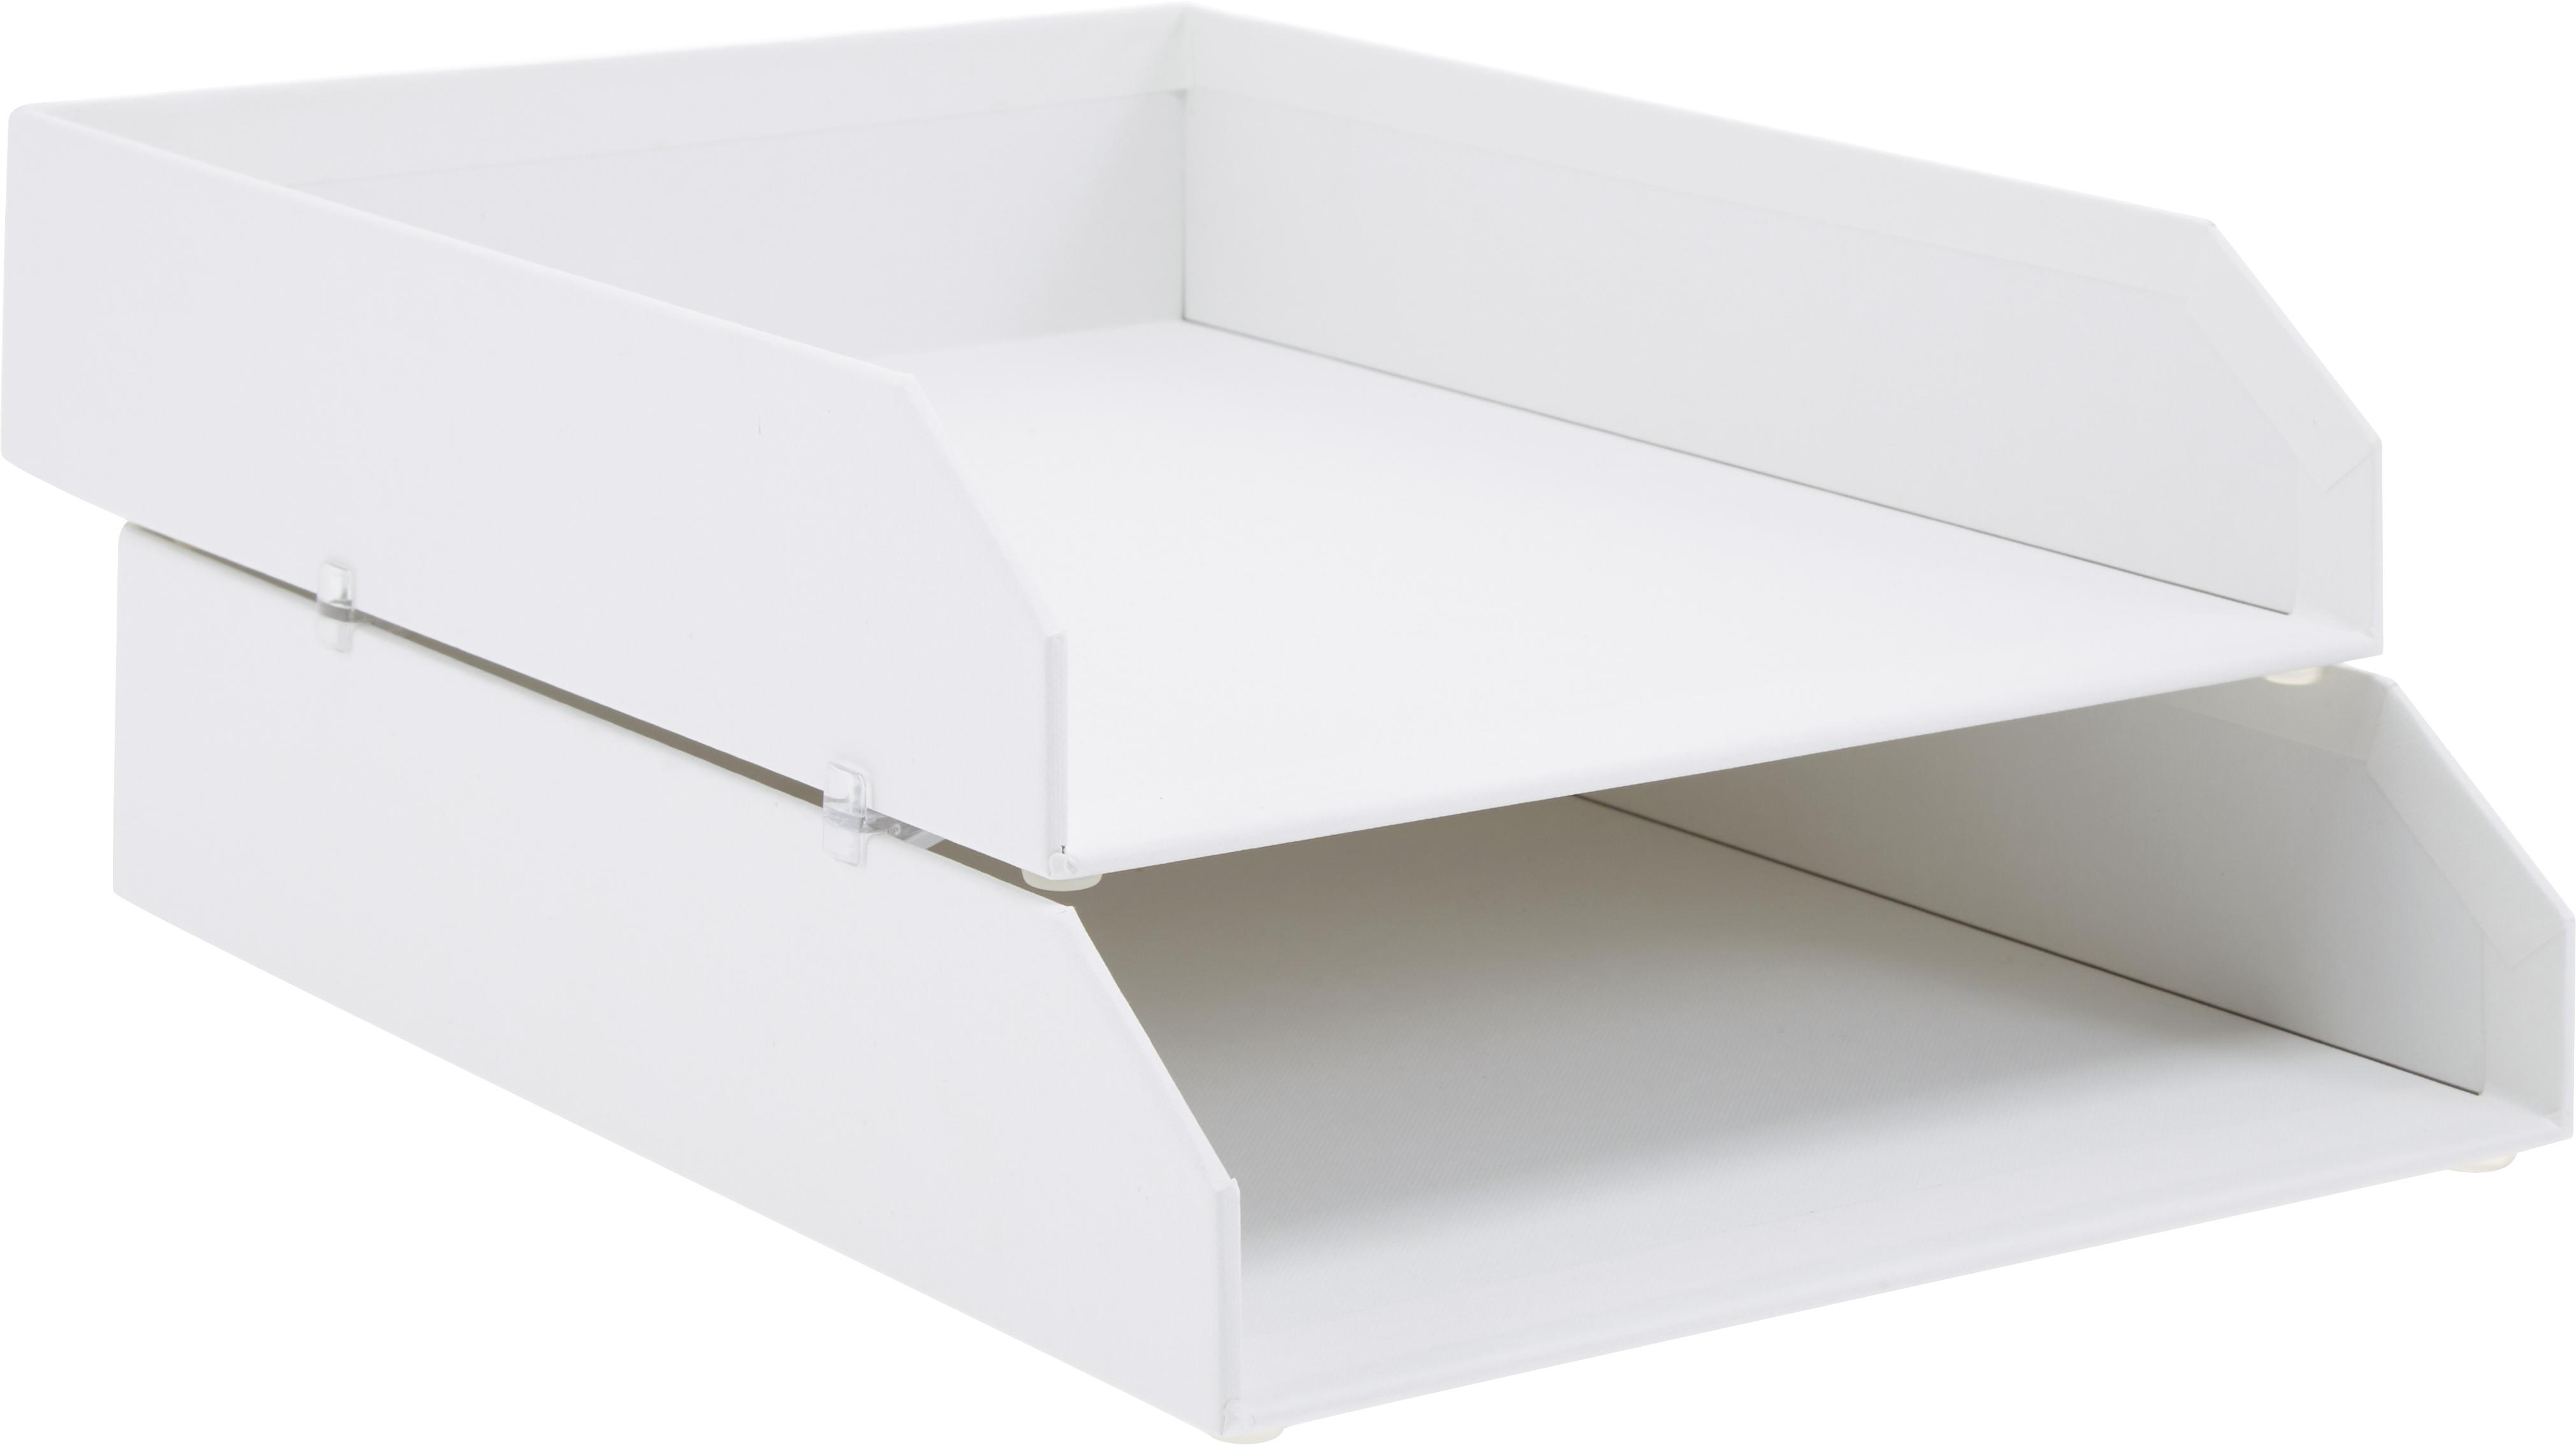 Vassoio per documenti Hakan, 2 pz., Solido, cartone laminato, Bianco, Larg. 23 x Prof. 31 cm